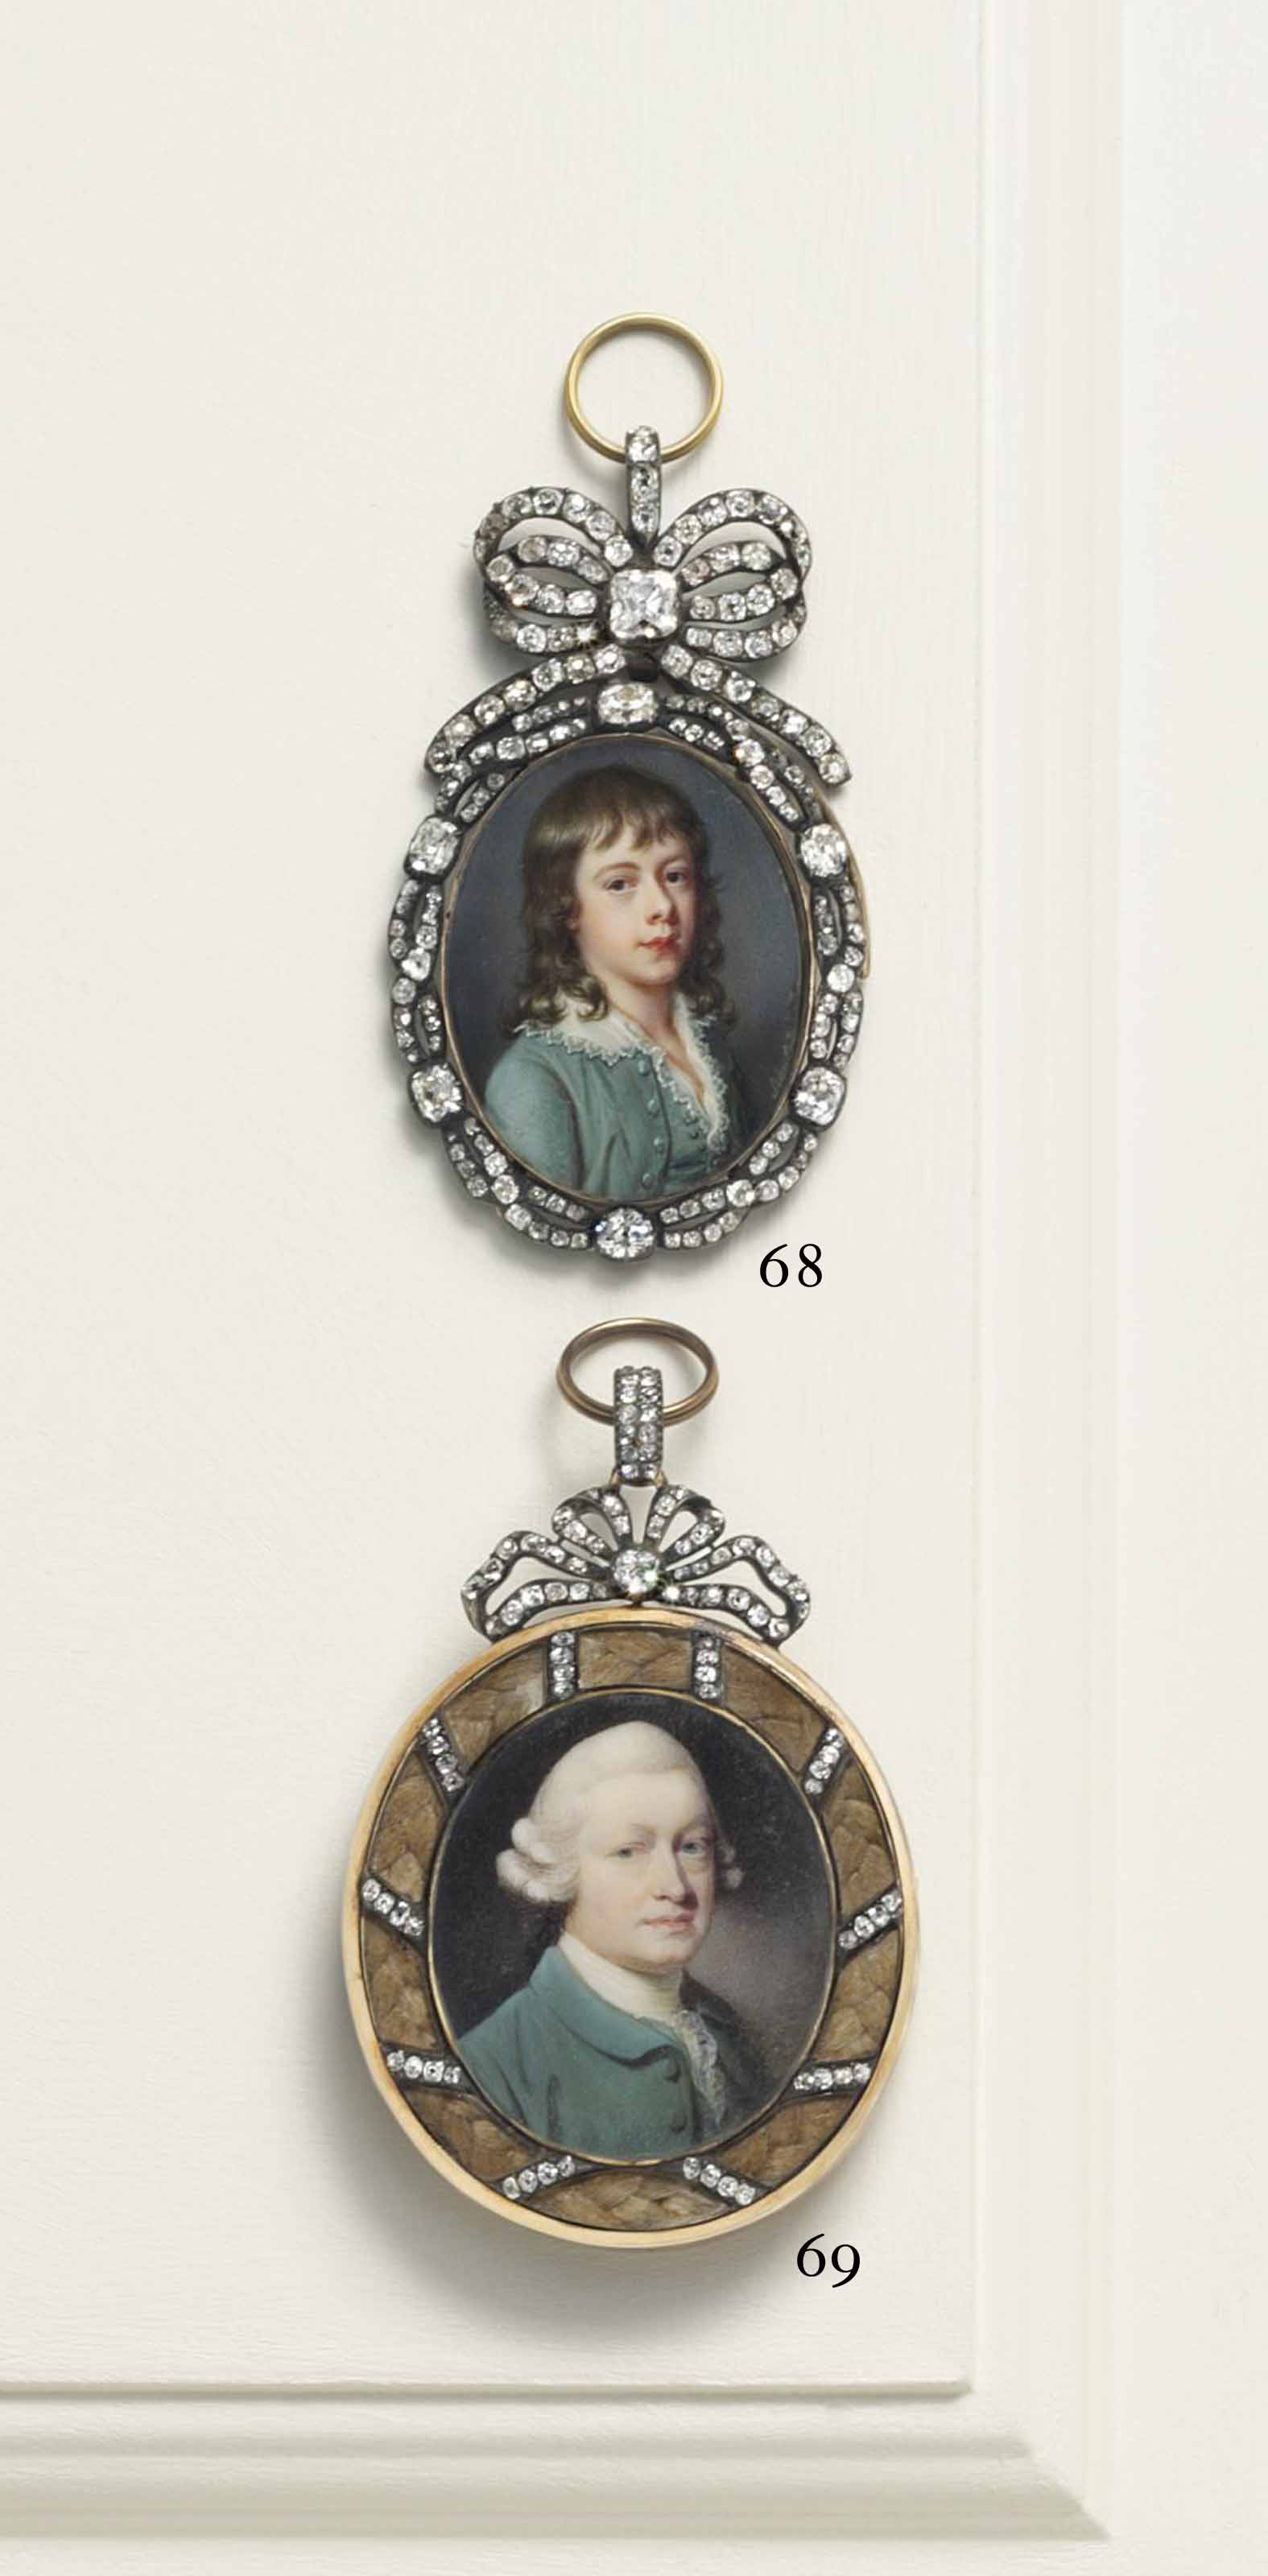 OZIAS HUMPHRY, R.A. (BRITISH, 1742-1810)